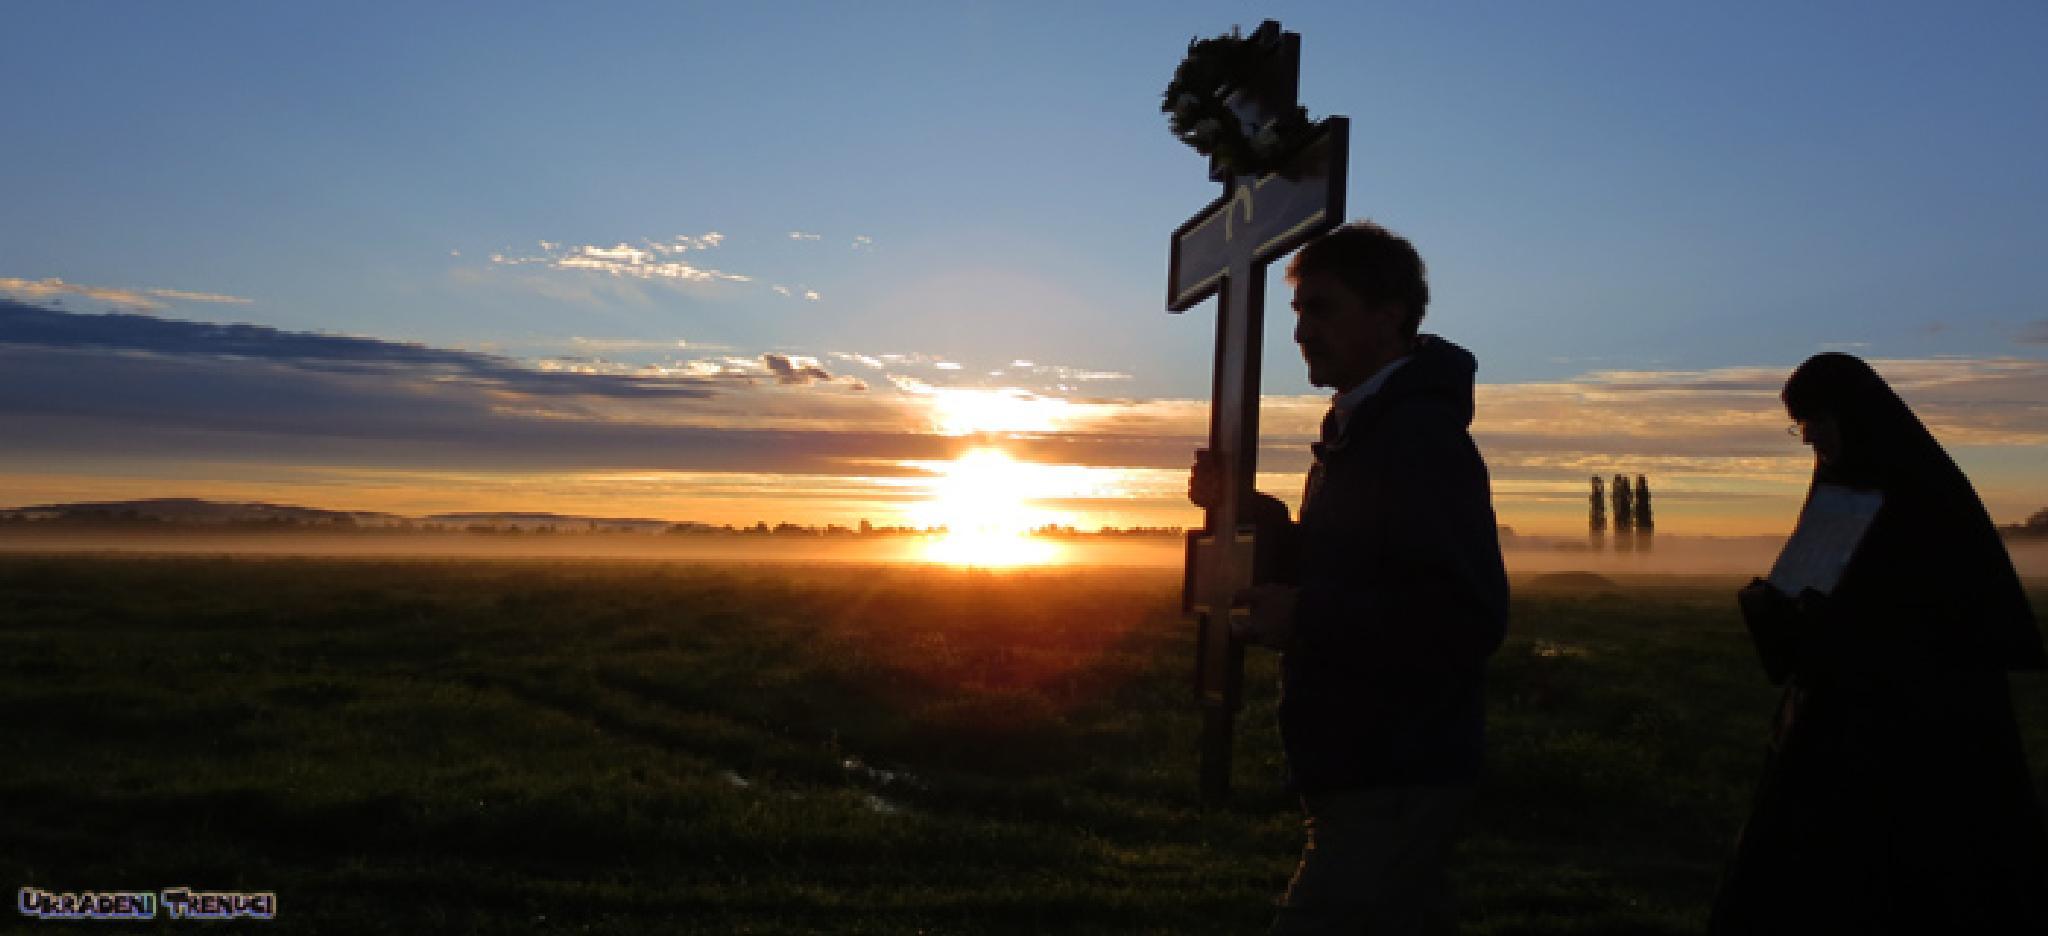 Morning on the scaffold (Jasenovac) - Jutro na gubilistu by Stolen Moments